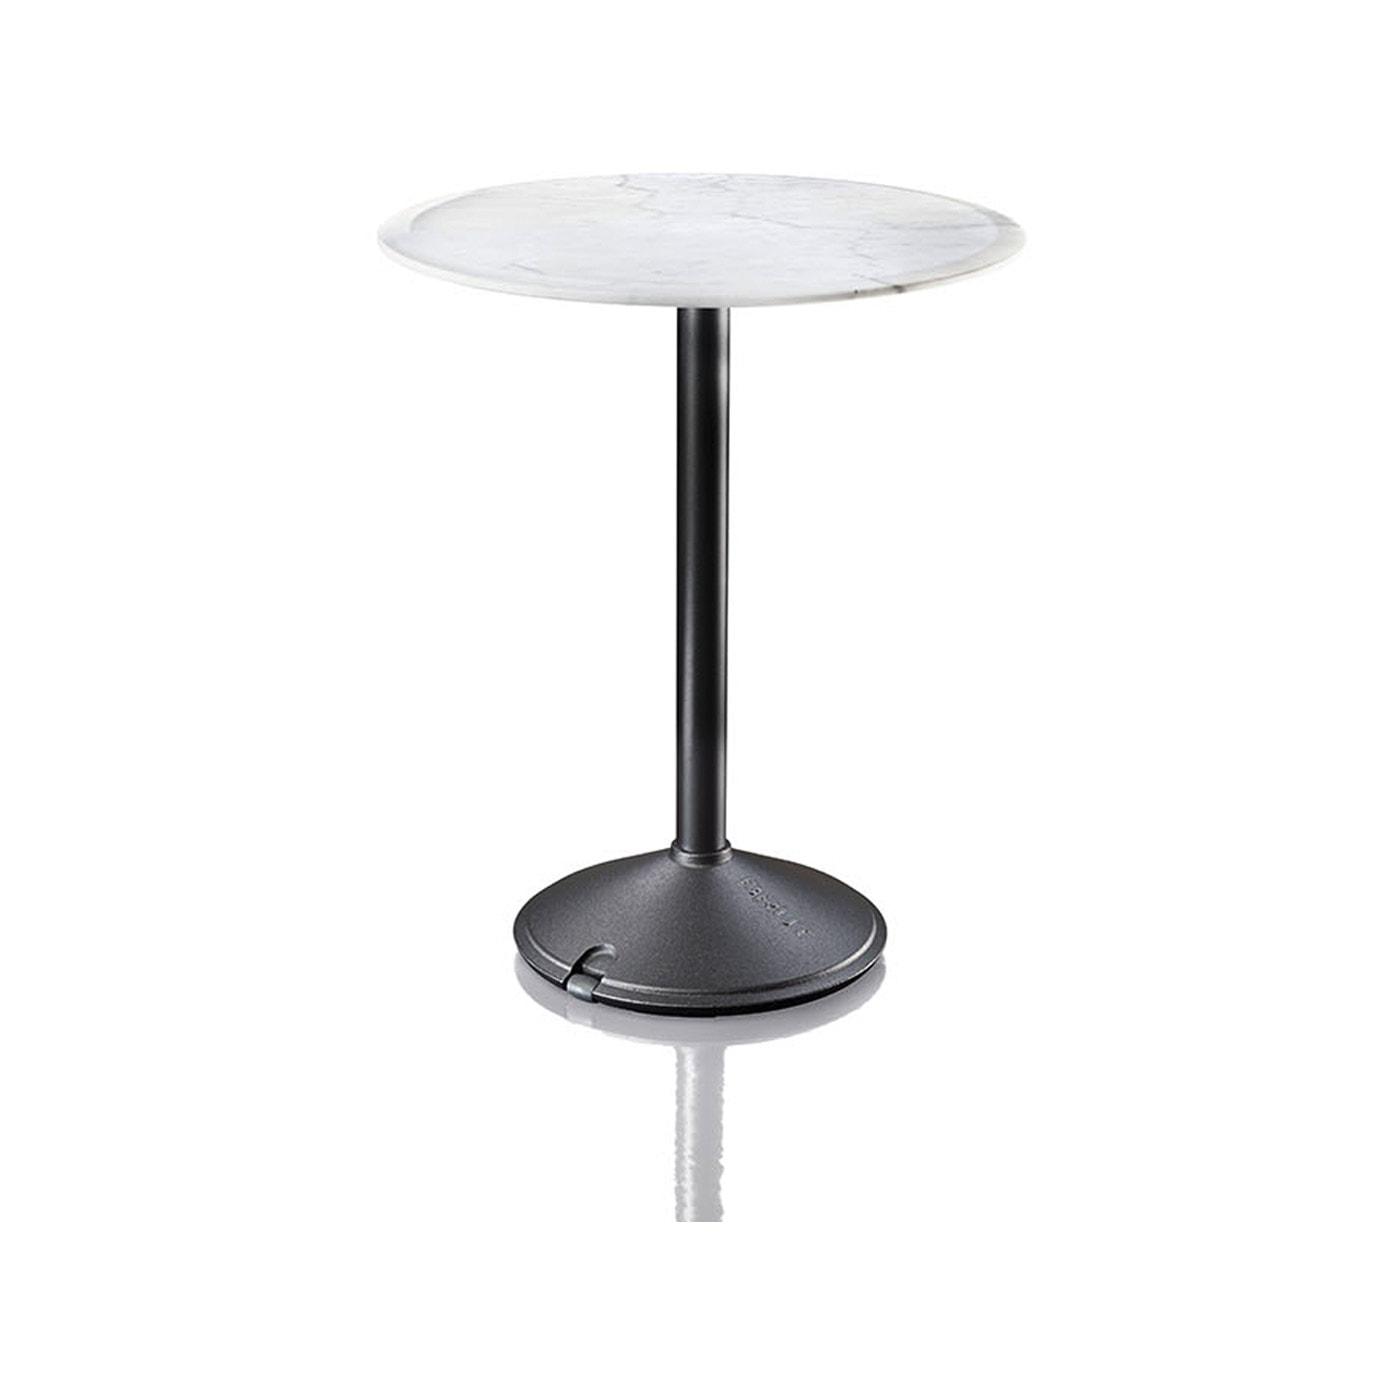 Magis Brut Bistro tavolo esterno